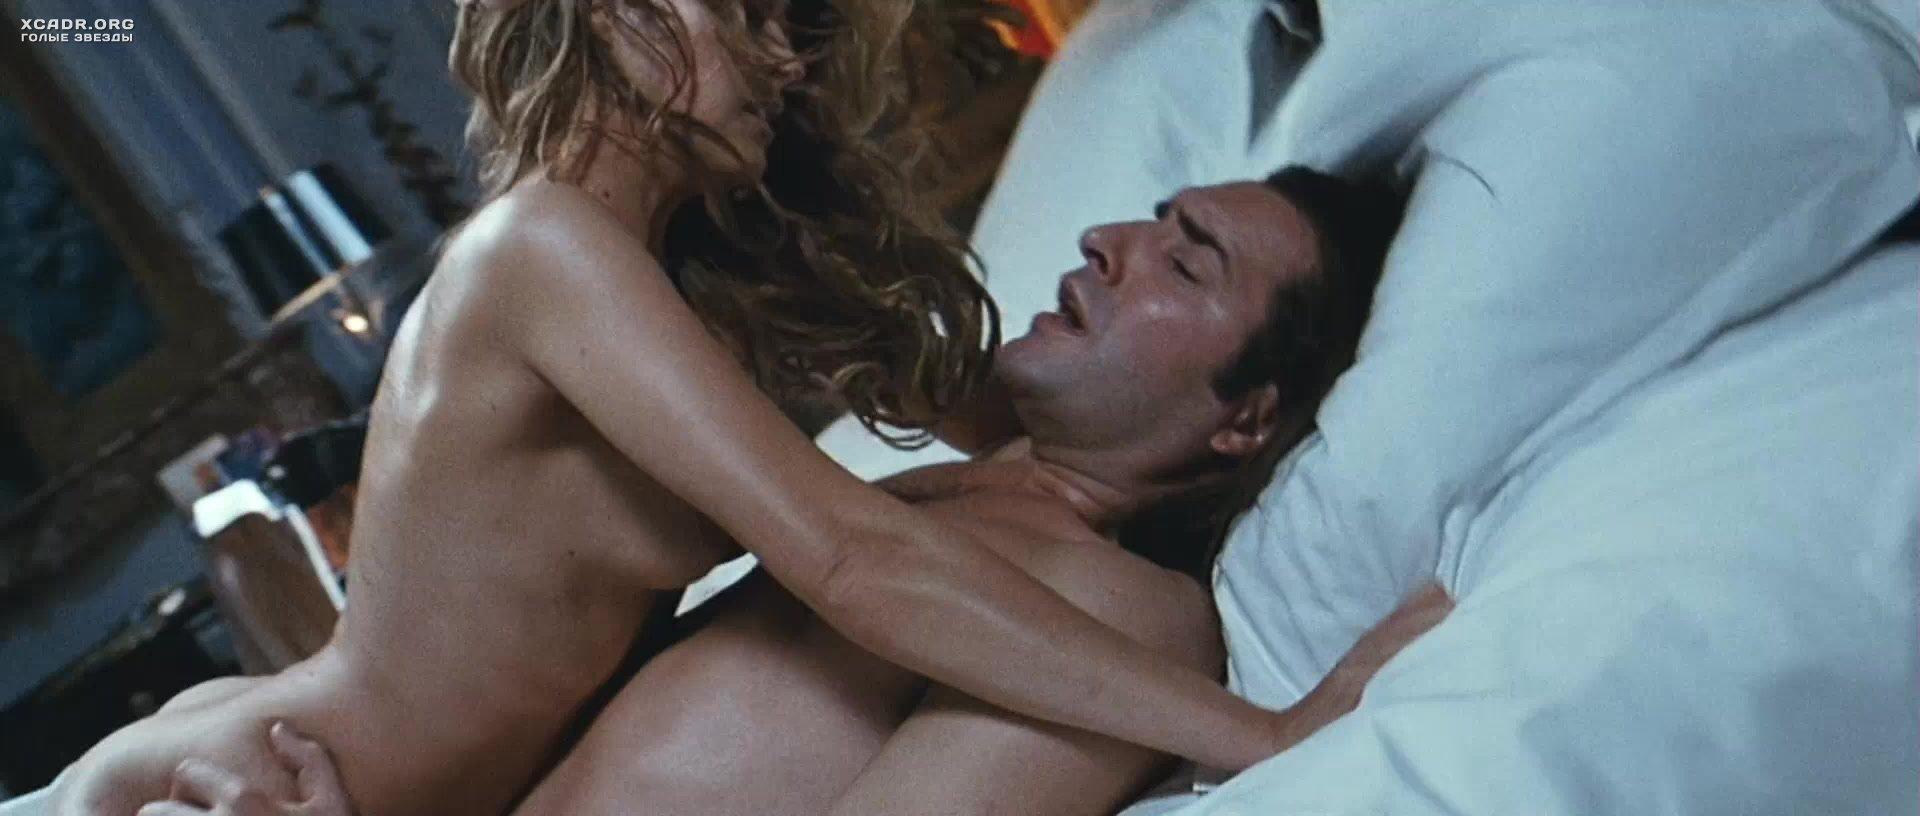 Worldwide celebrity sex videos